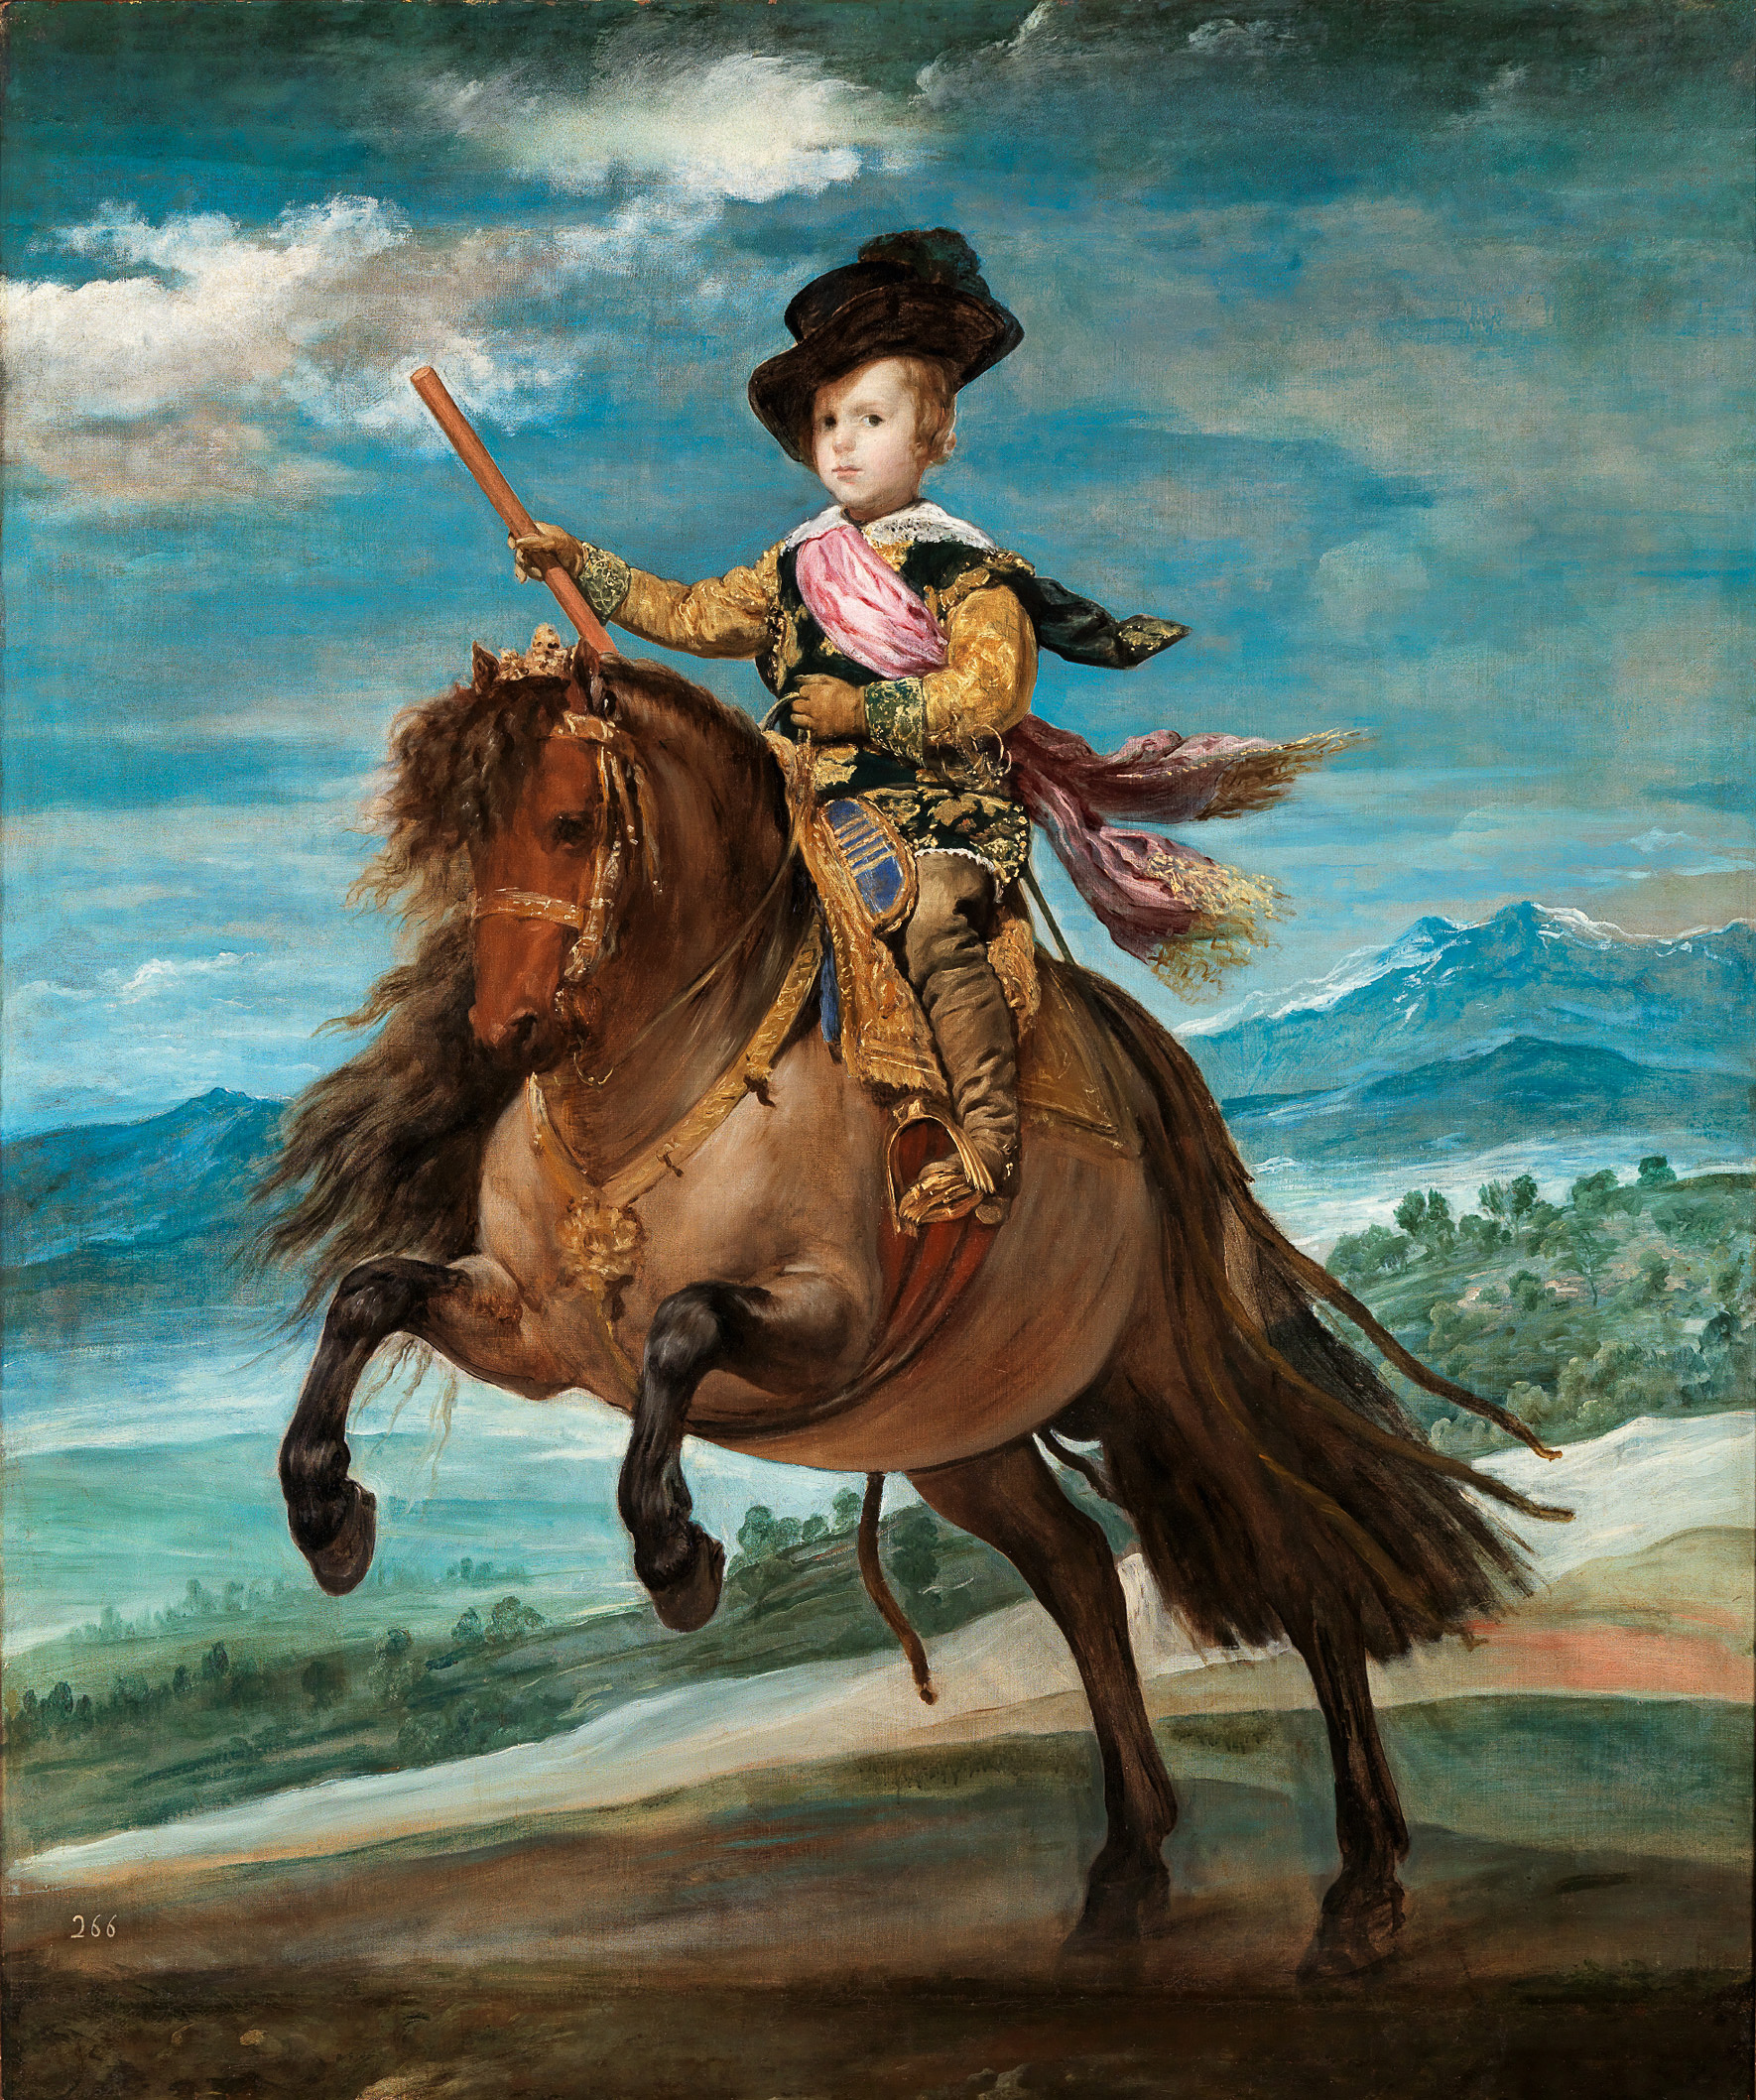 Prinz Baltasar Carlos zu Pferd    (1.7 MB)  Diego Velázquez 1635 Öl auf Leinwand, 209 x 173 cm © Madrid, Museo del Prado